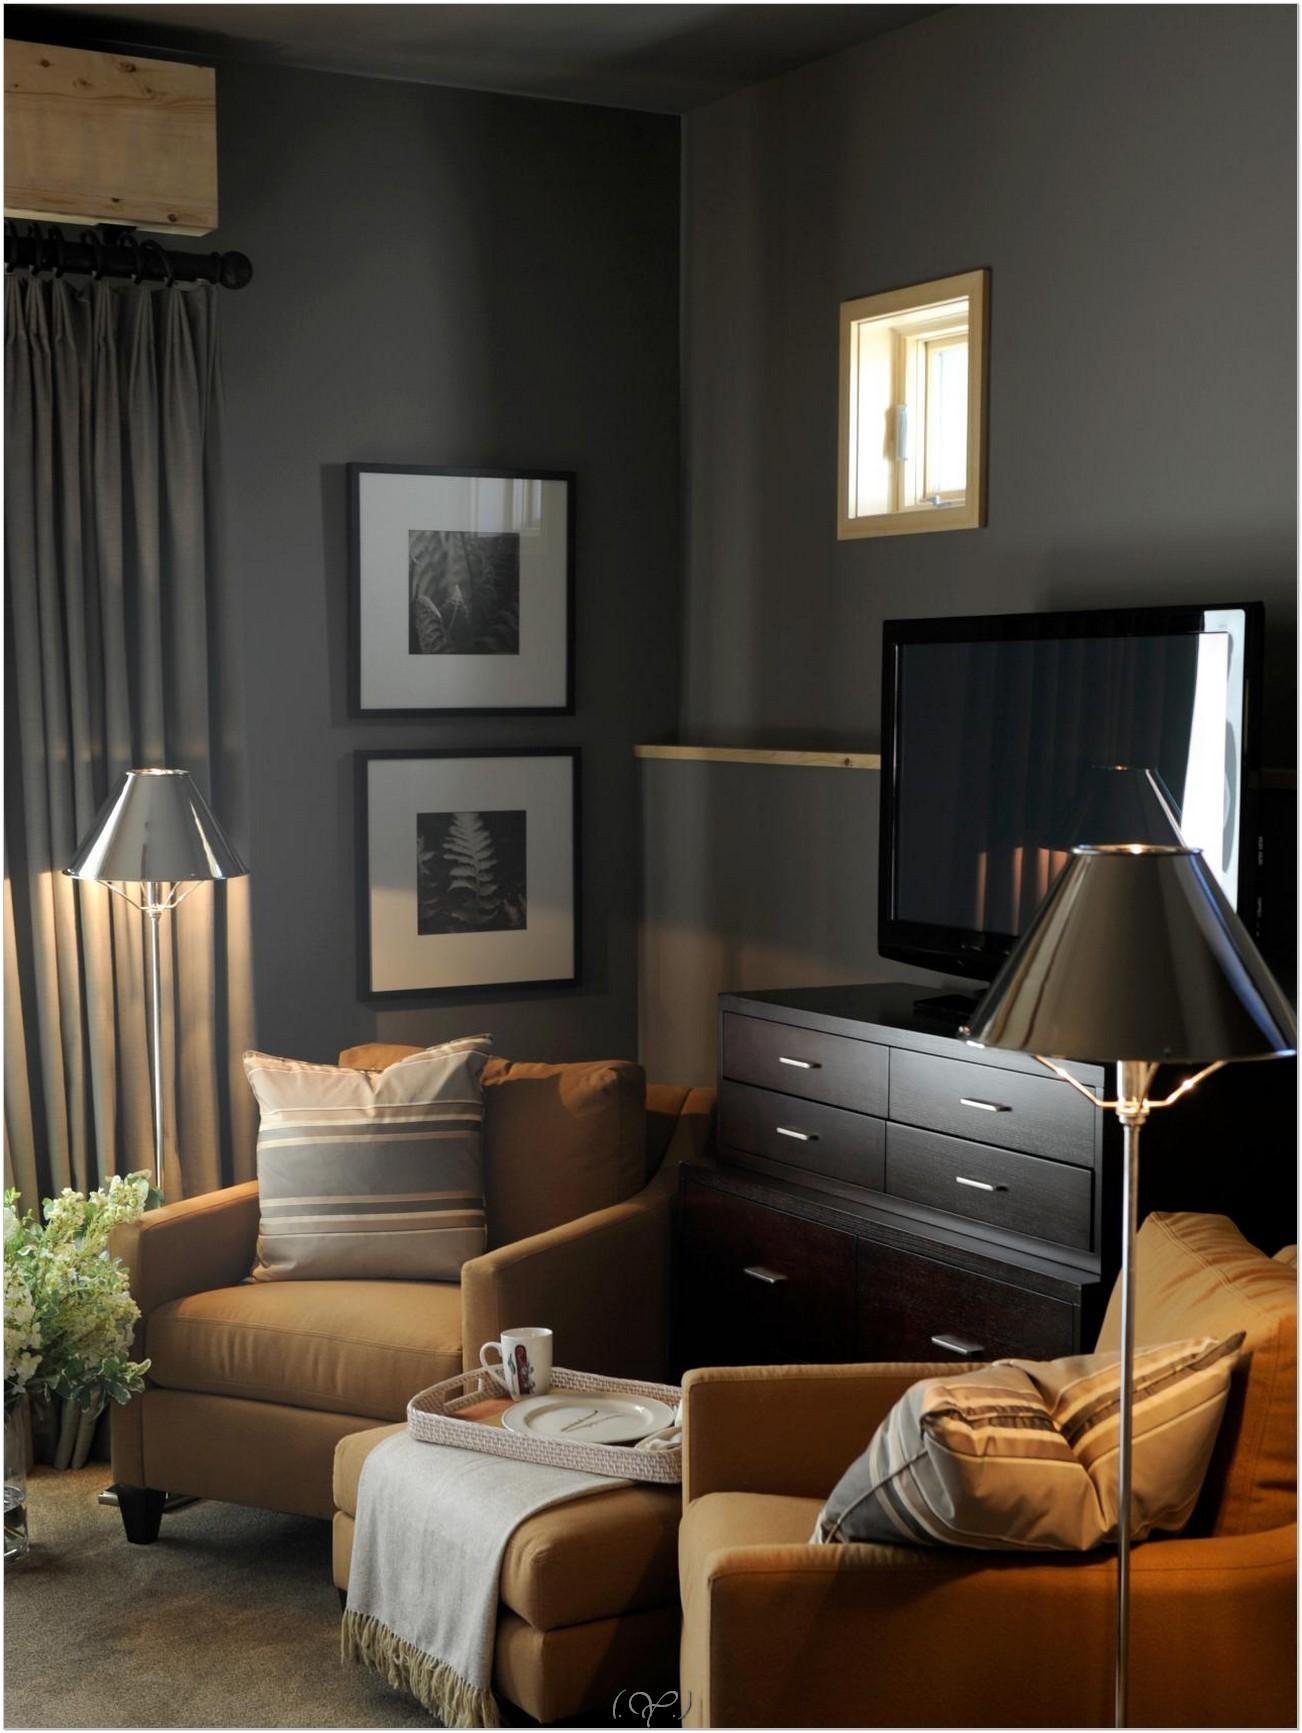 bedroom sitting area furniture ideas photo - 8